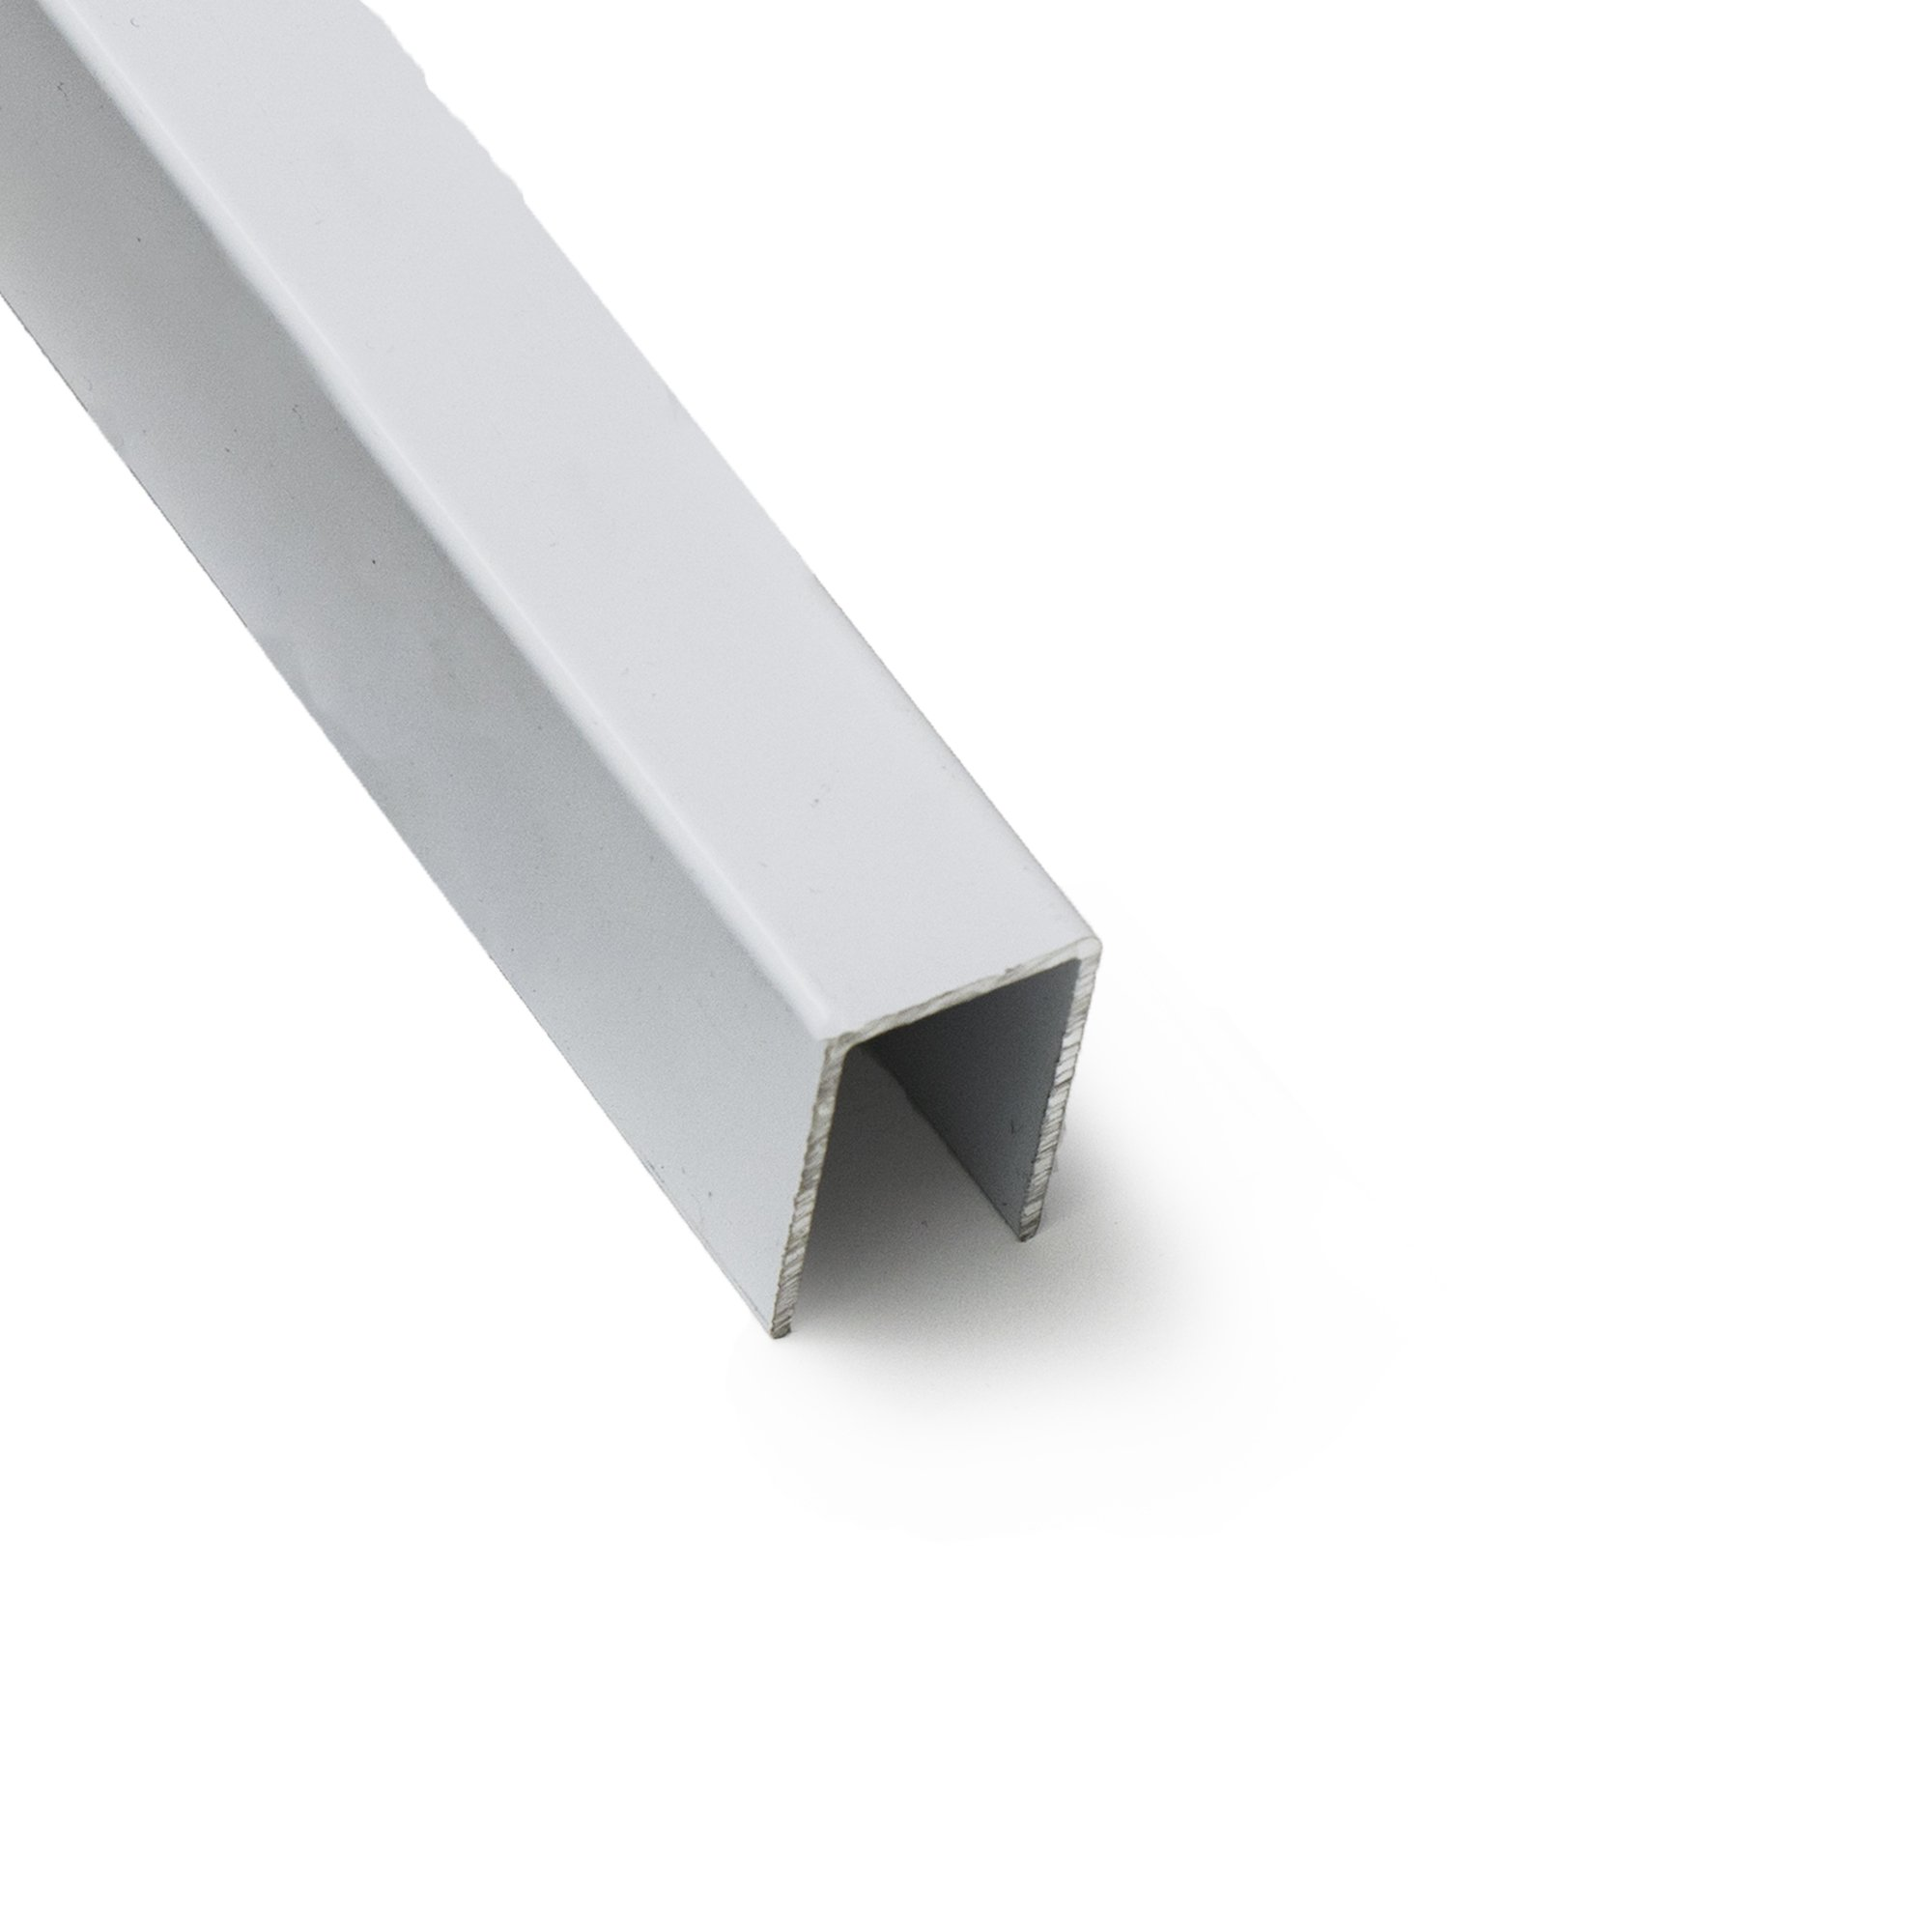 Sliding Screen Door Track - Top U Channel 5/8'' Wide x 1'' Deep (White)